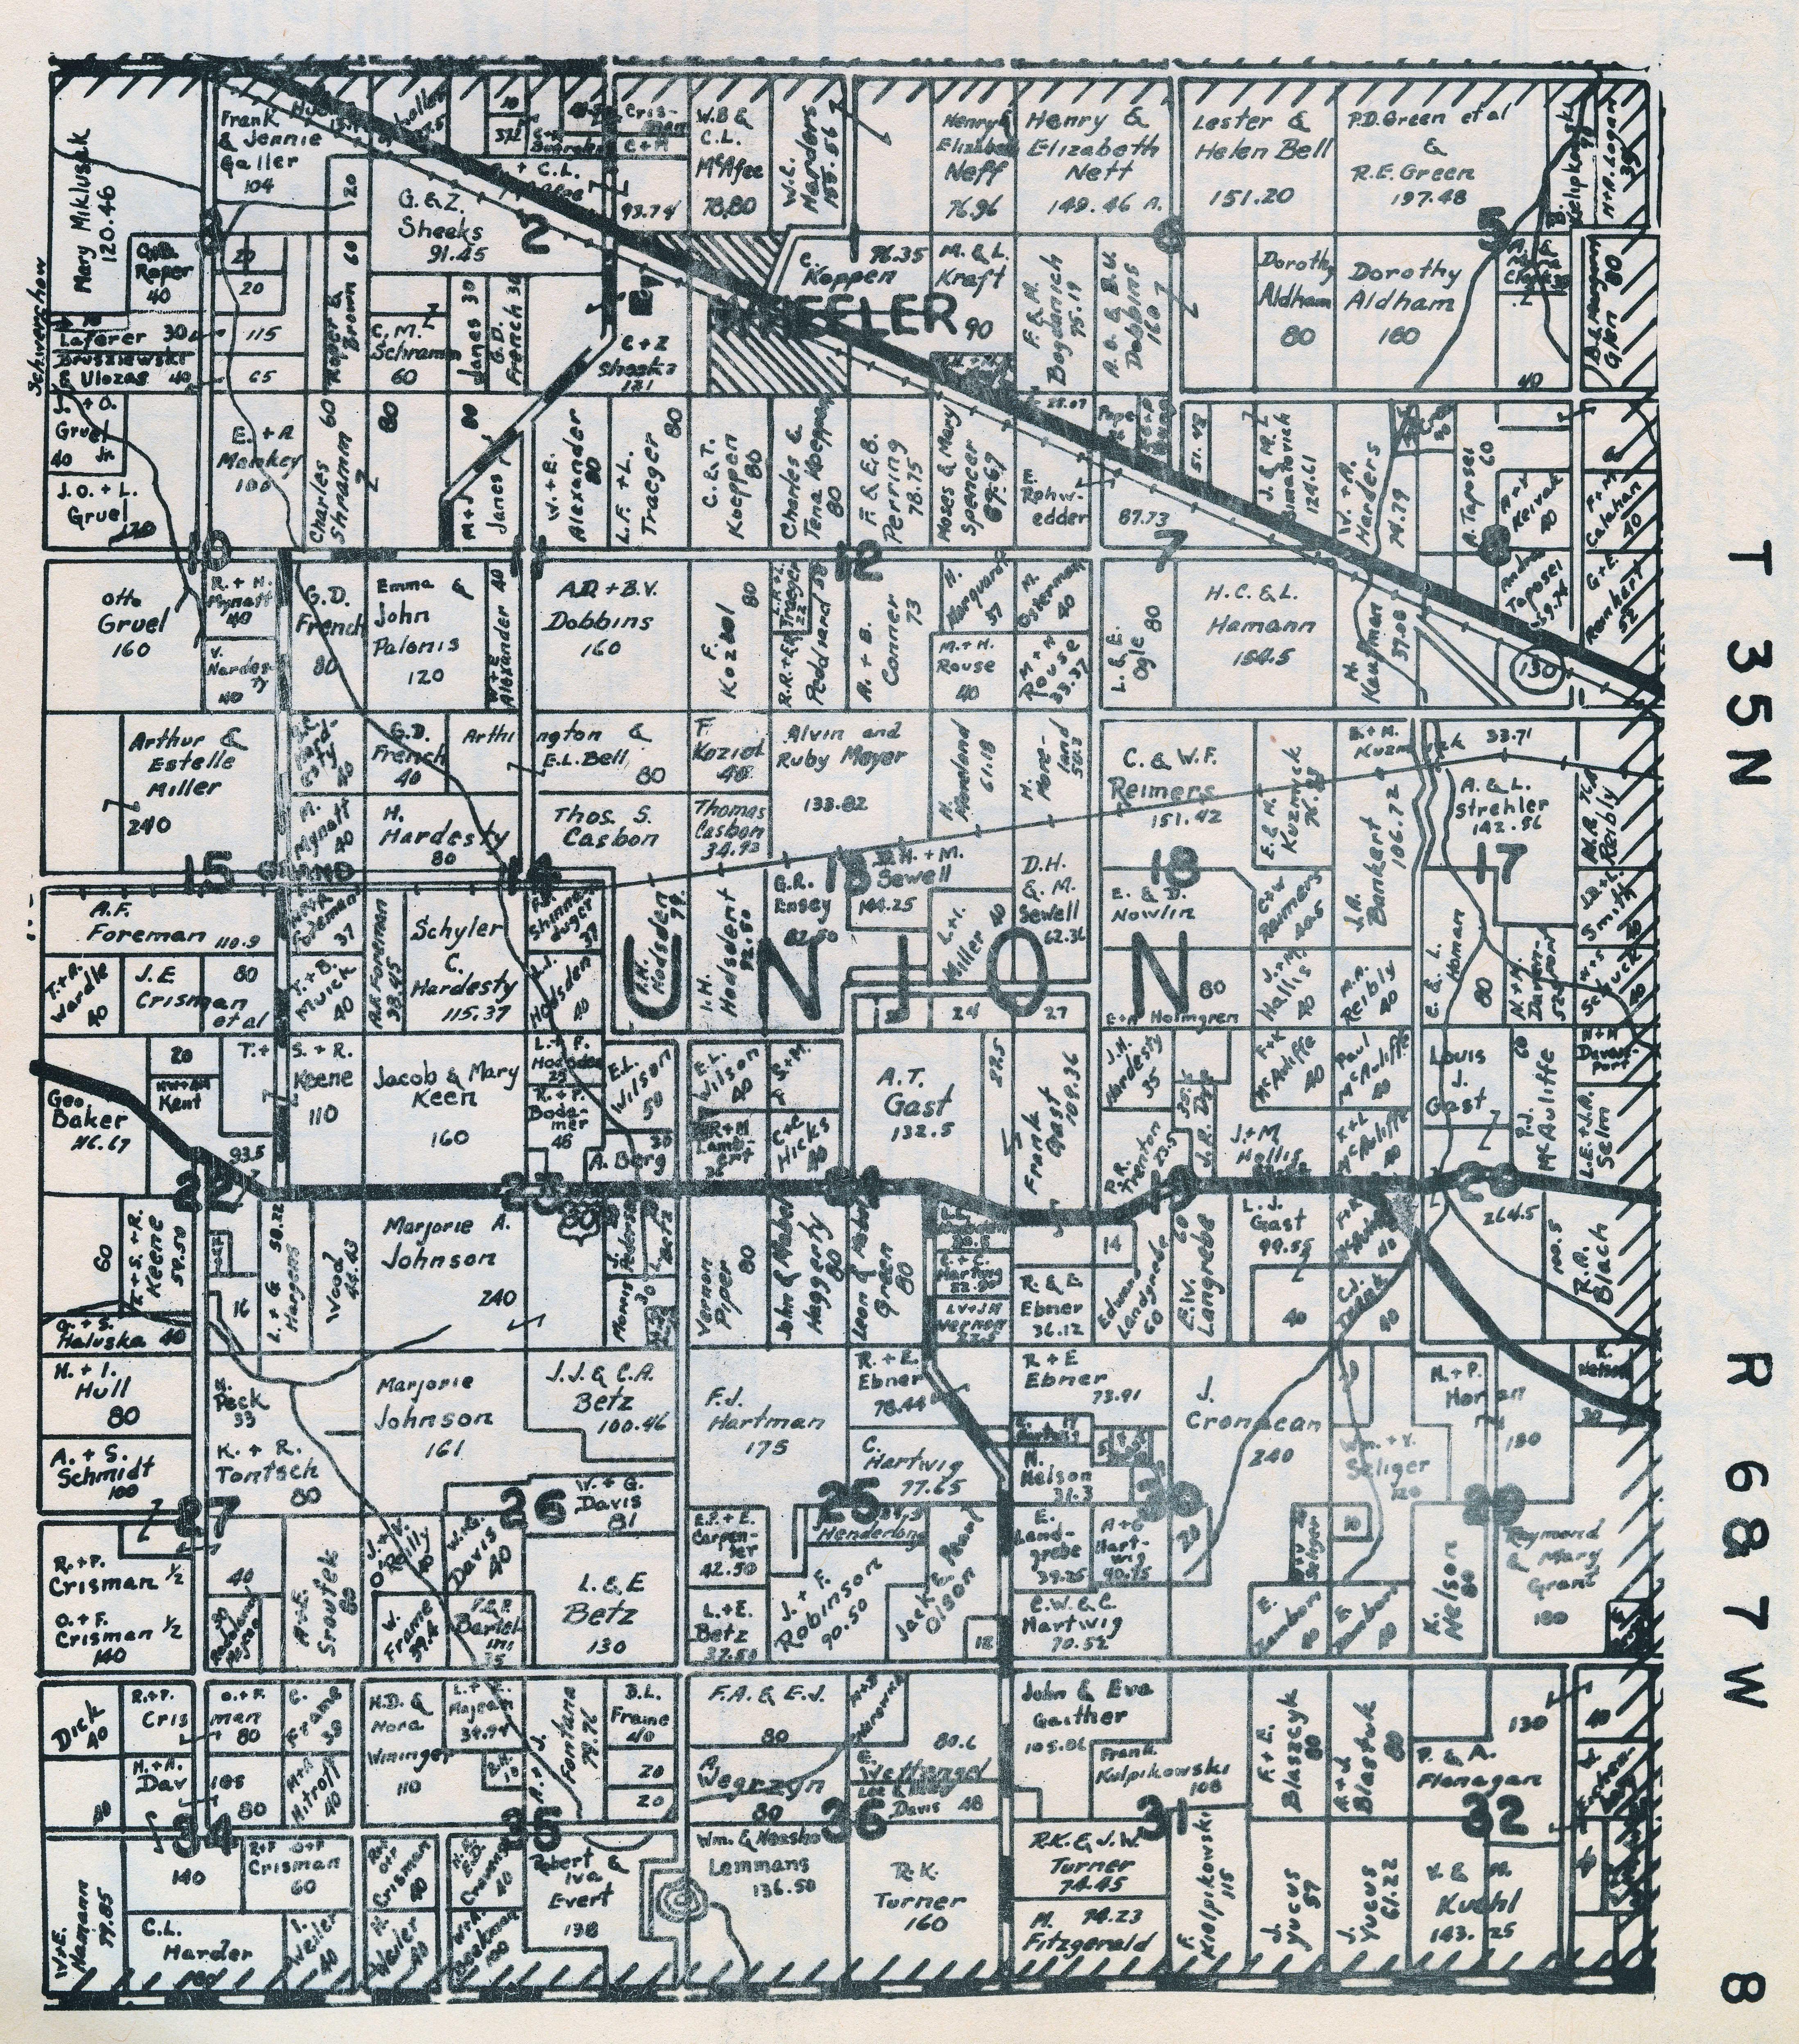 Porter County Indiana Genweb Union Township Maps